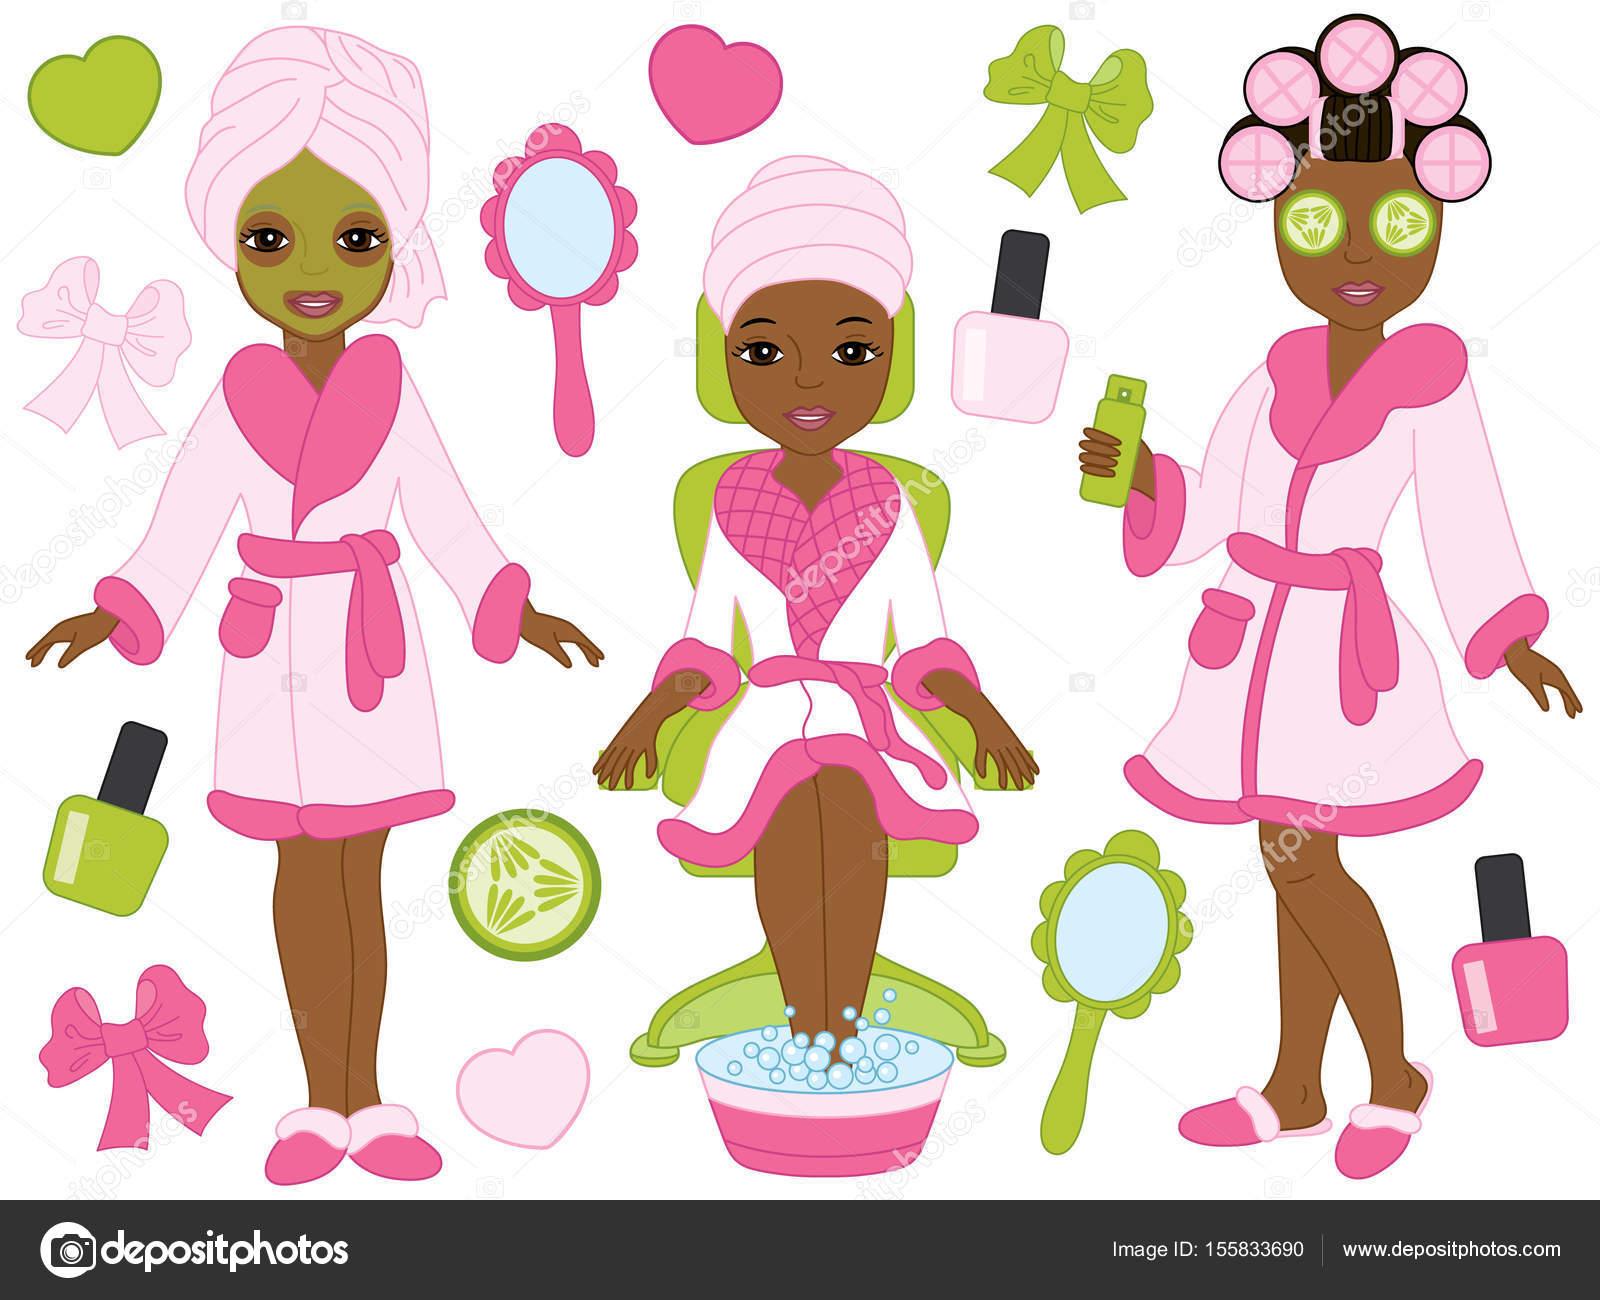 Wellness clipart  Vektor afroamerikanische Spa Mädchen gesetzt. Vektor-Spa. Spa ...